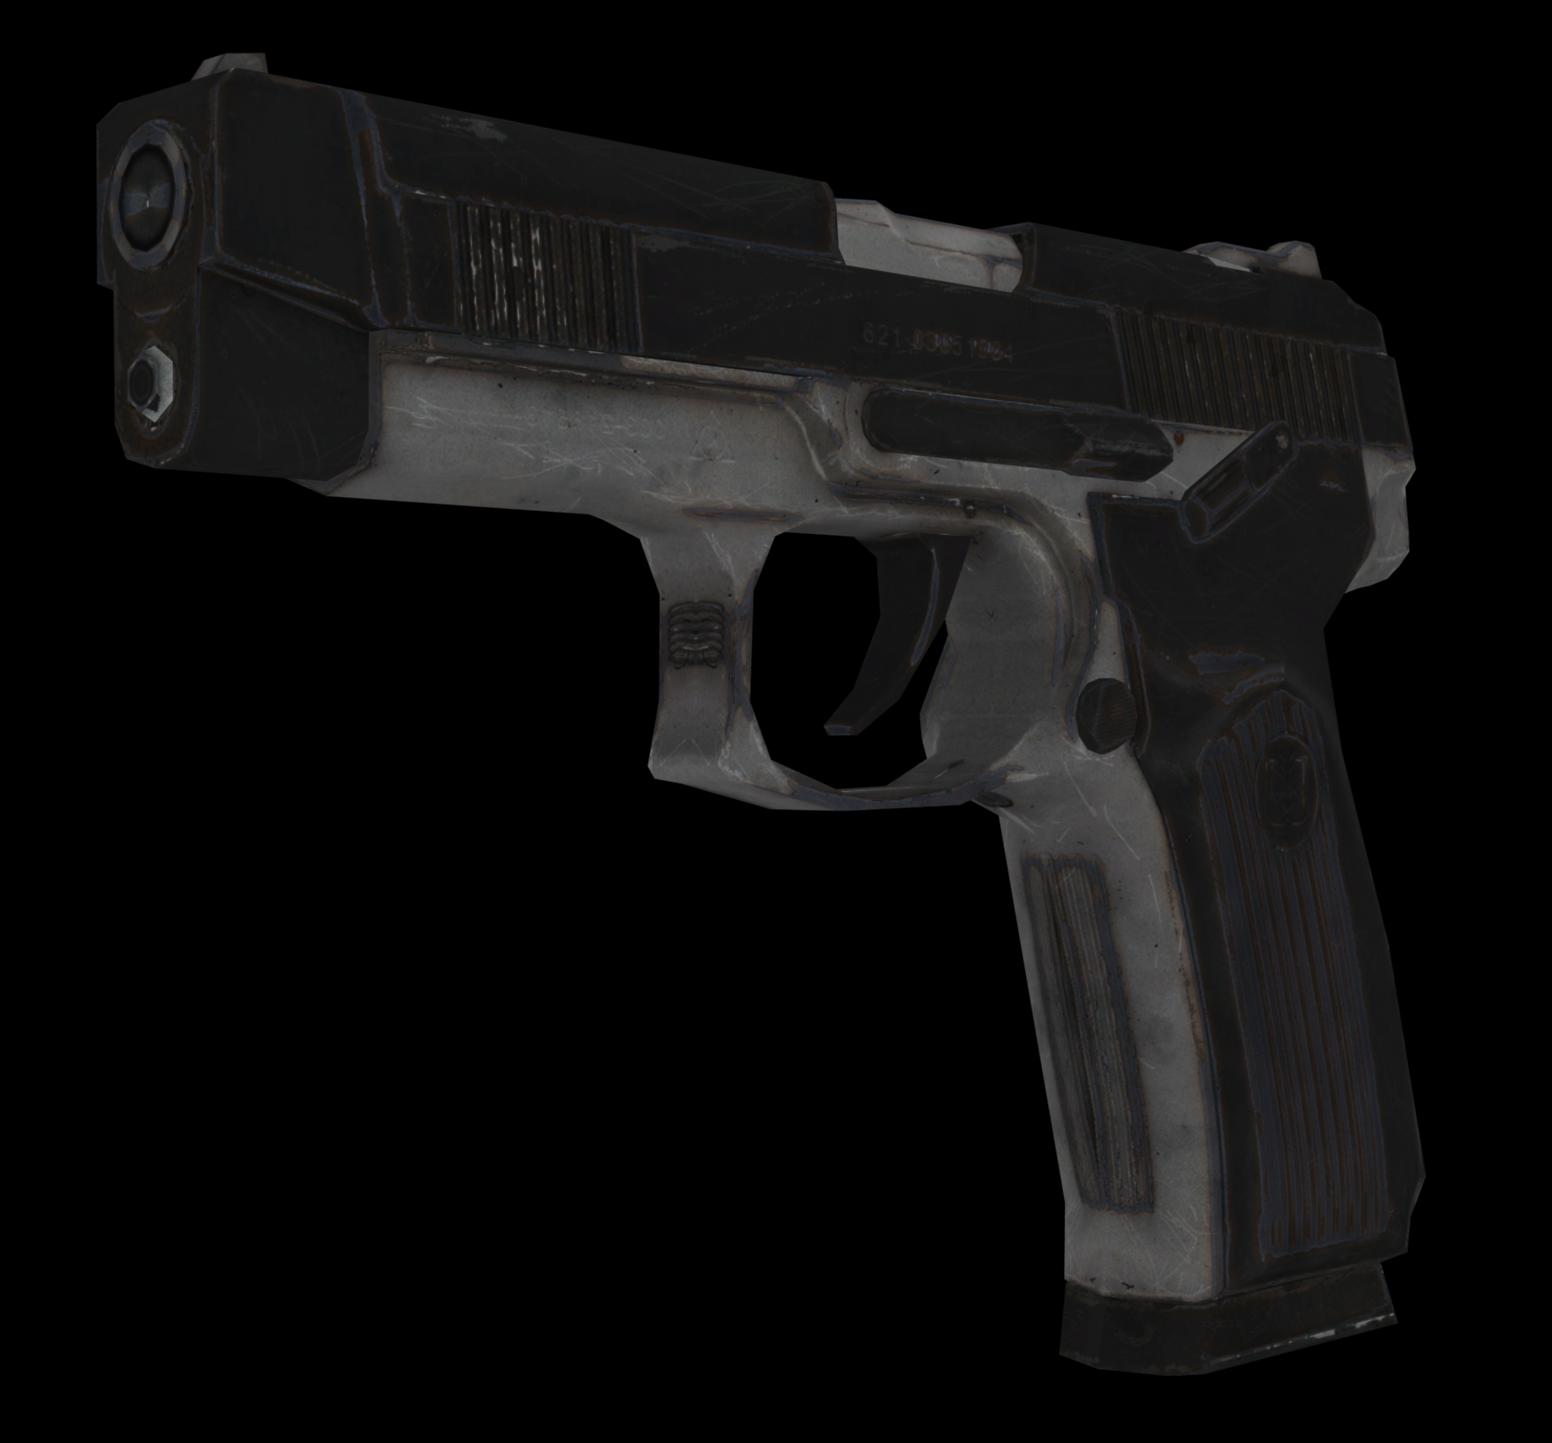 Image - MP-443 Grach model CoD...